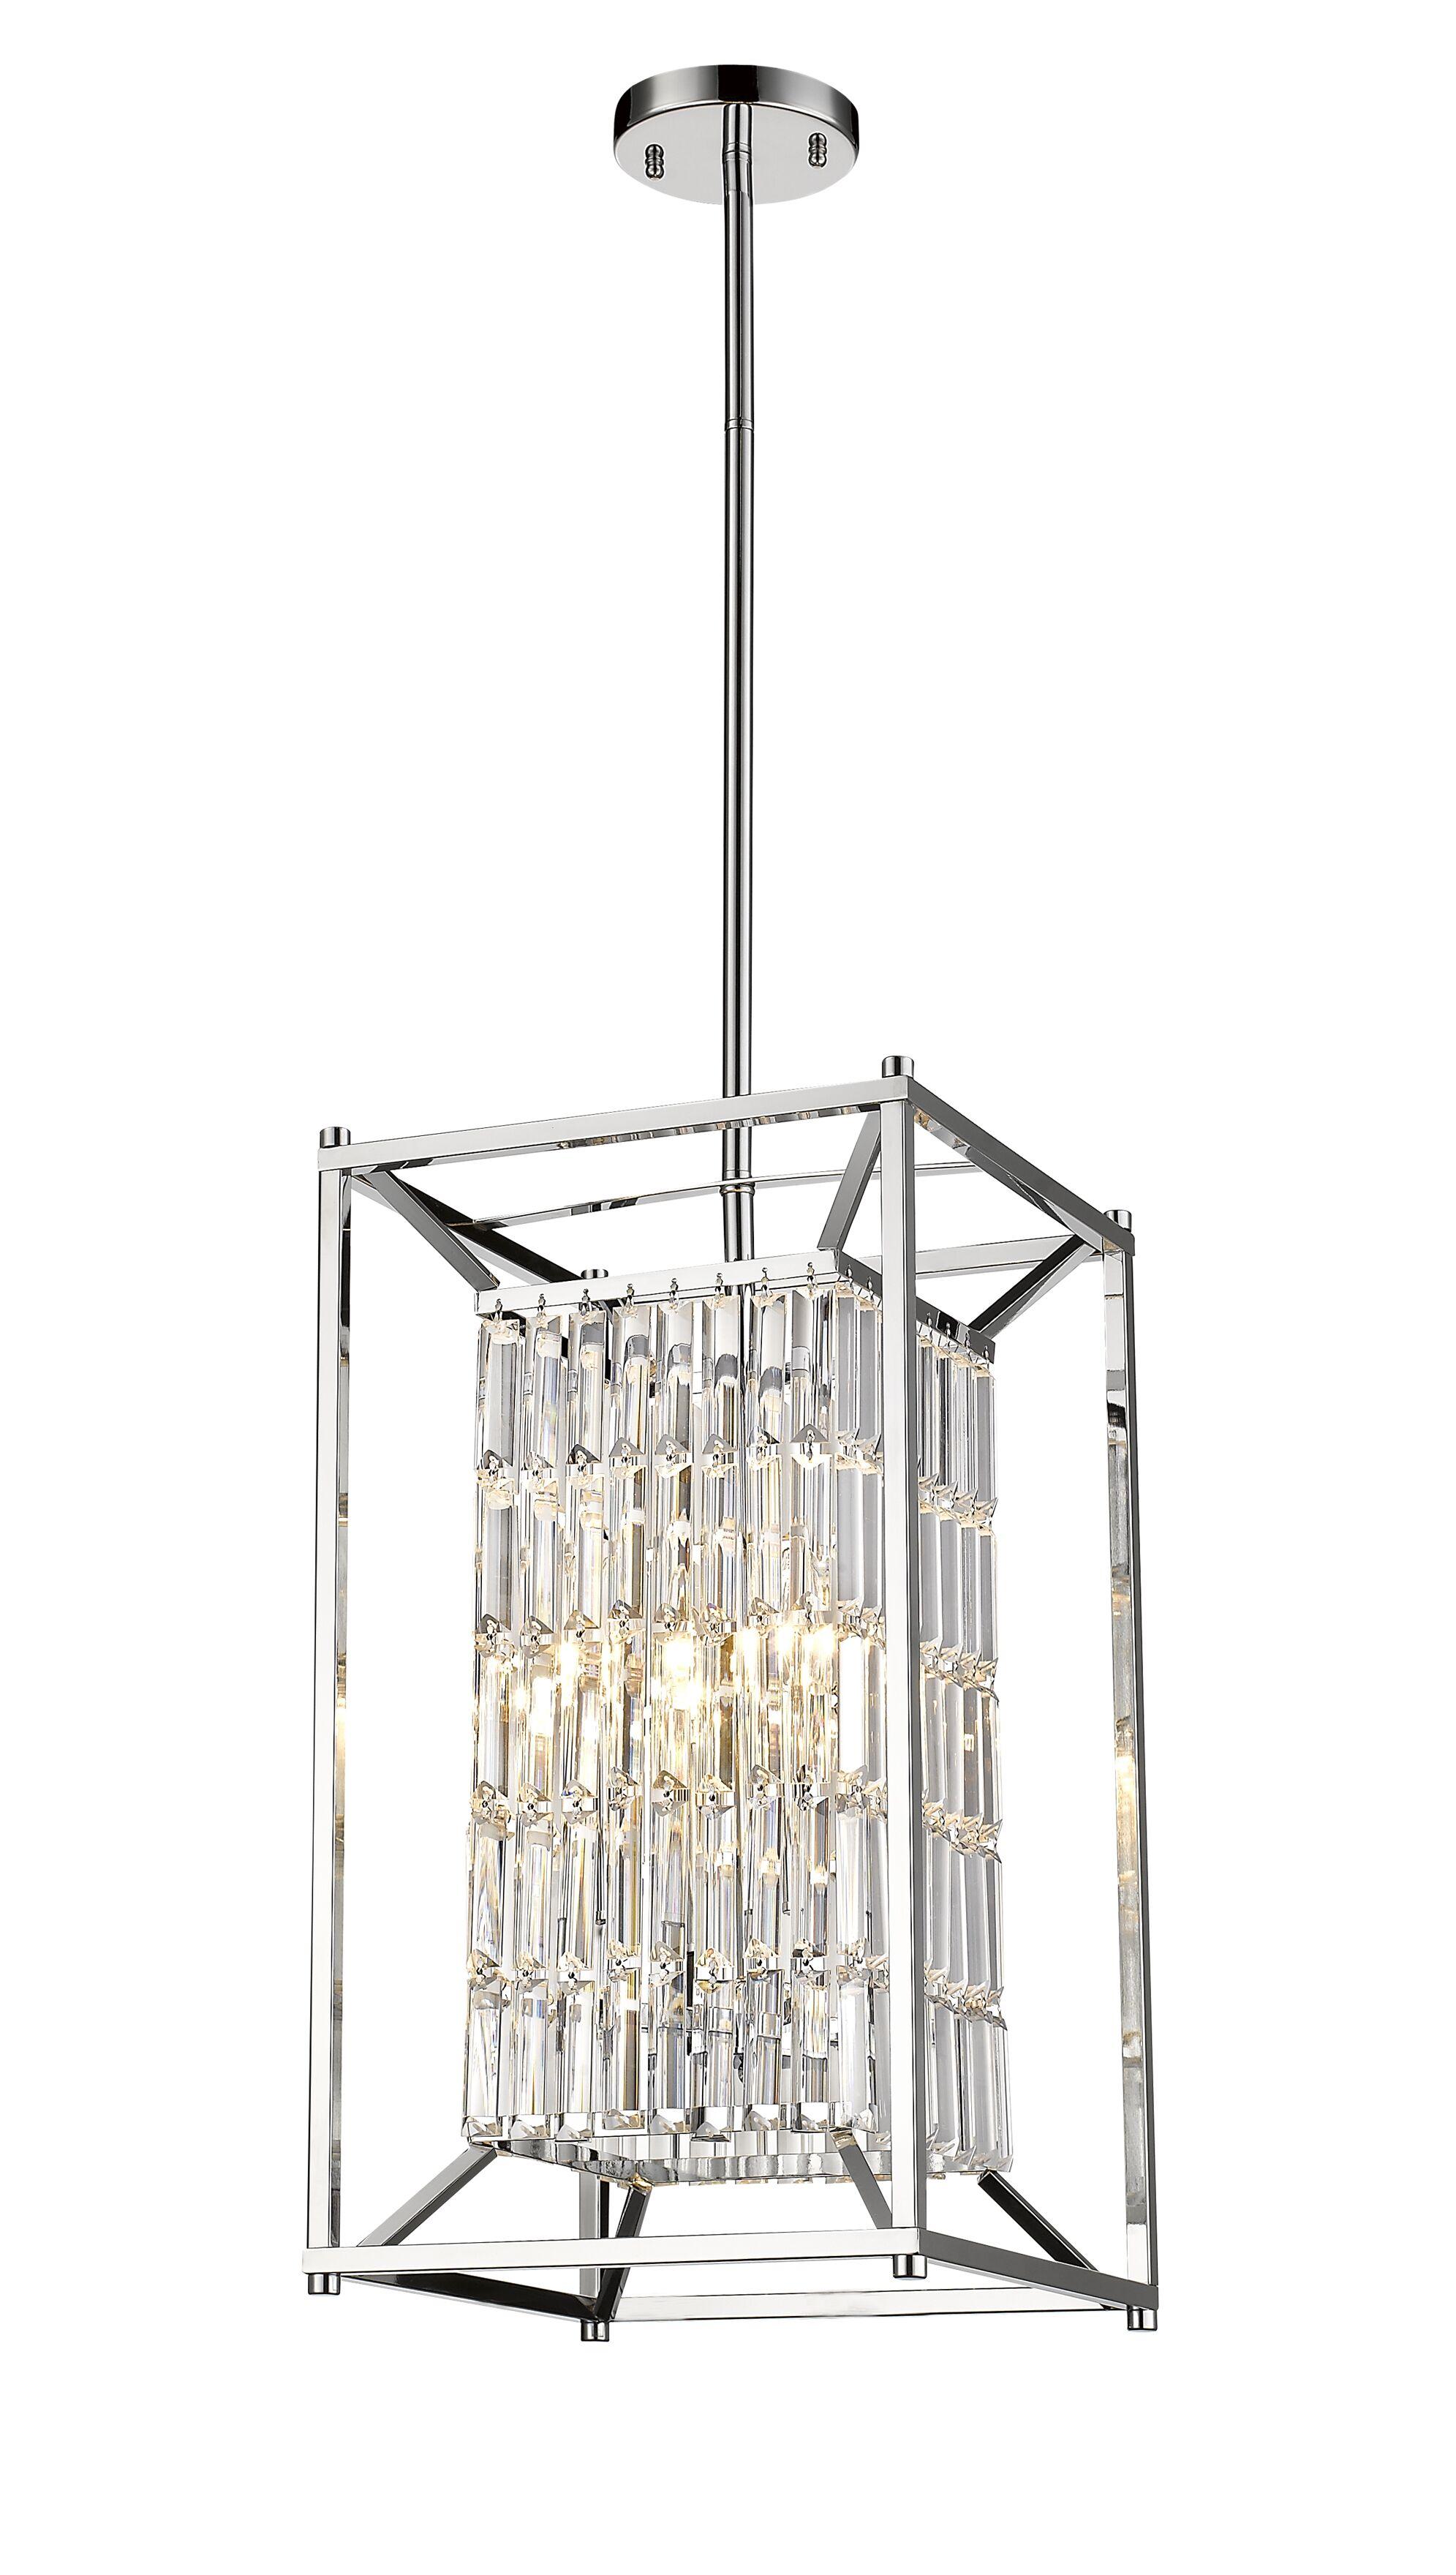 Bourdages 4-Light Square/Rectangle Pendant